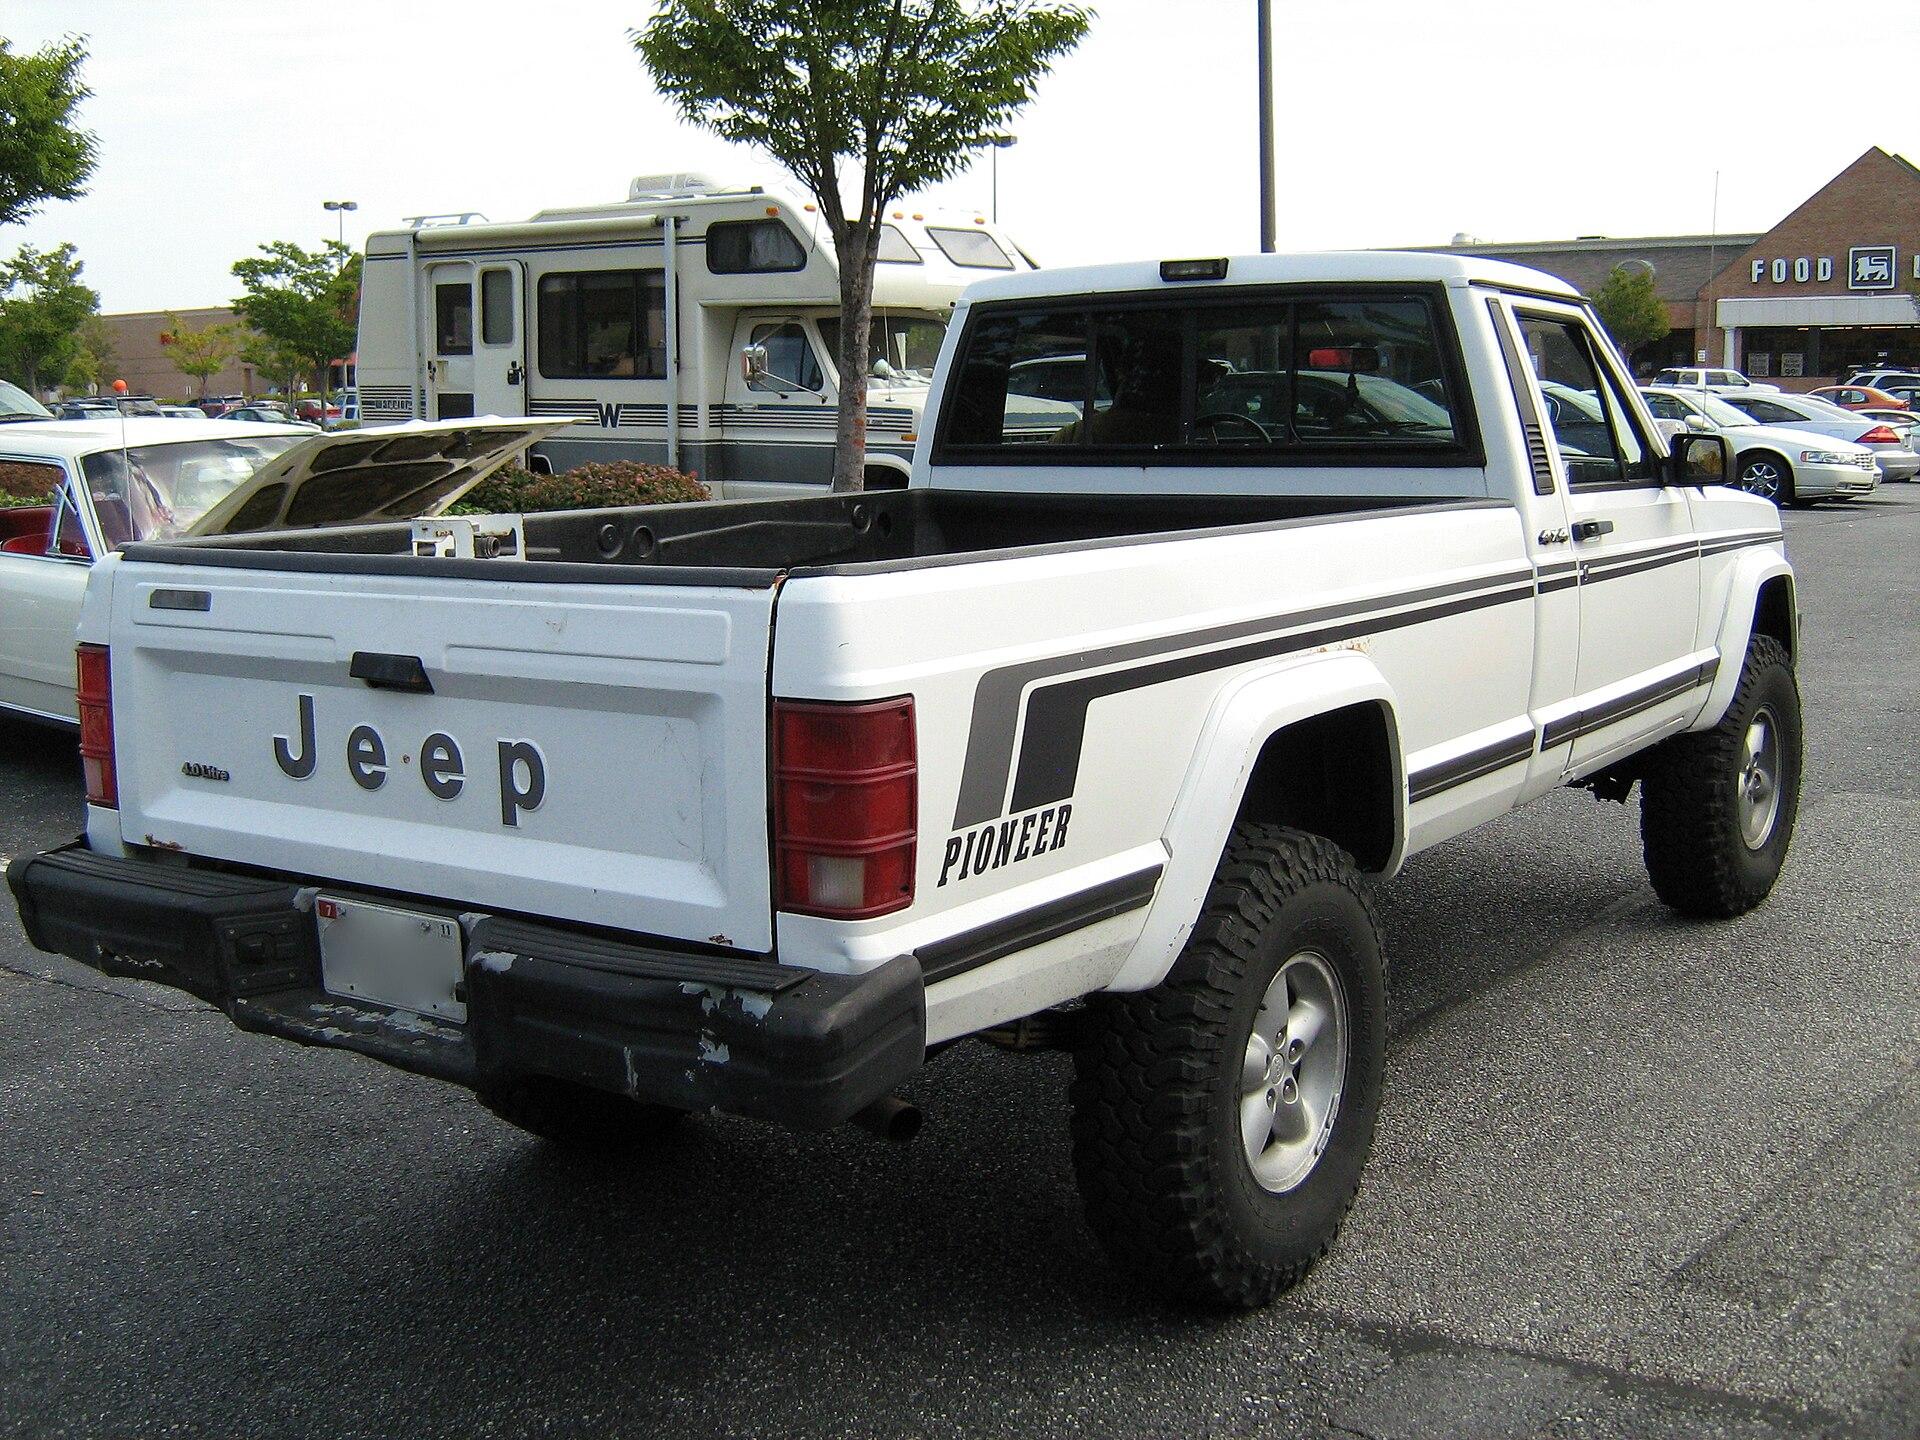 Px Jeep Comanche Pioneer White Md R on 2003 Dodge Dakota 4 7